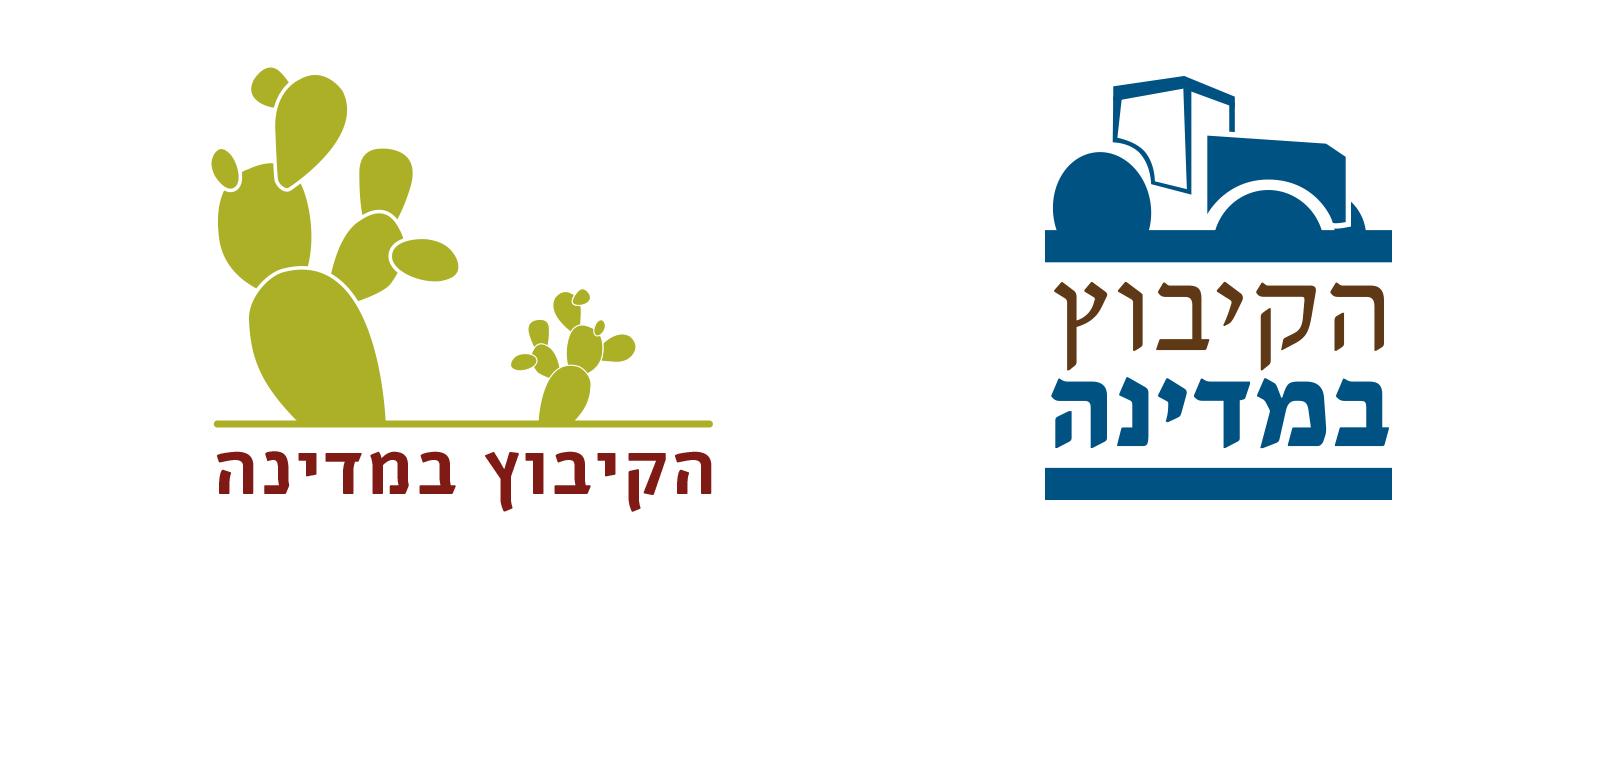 http://bigeyes.co.il/wp-content/uploads/2019/06/KibbutzBooks-logo-3.png